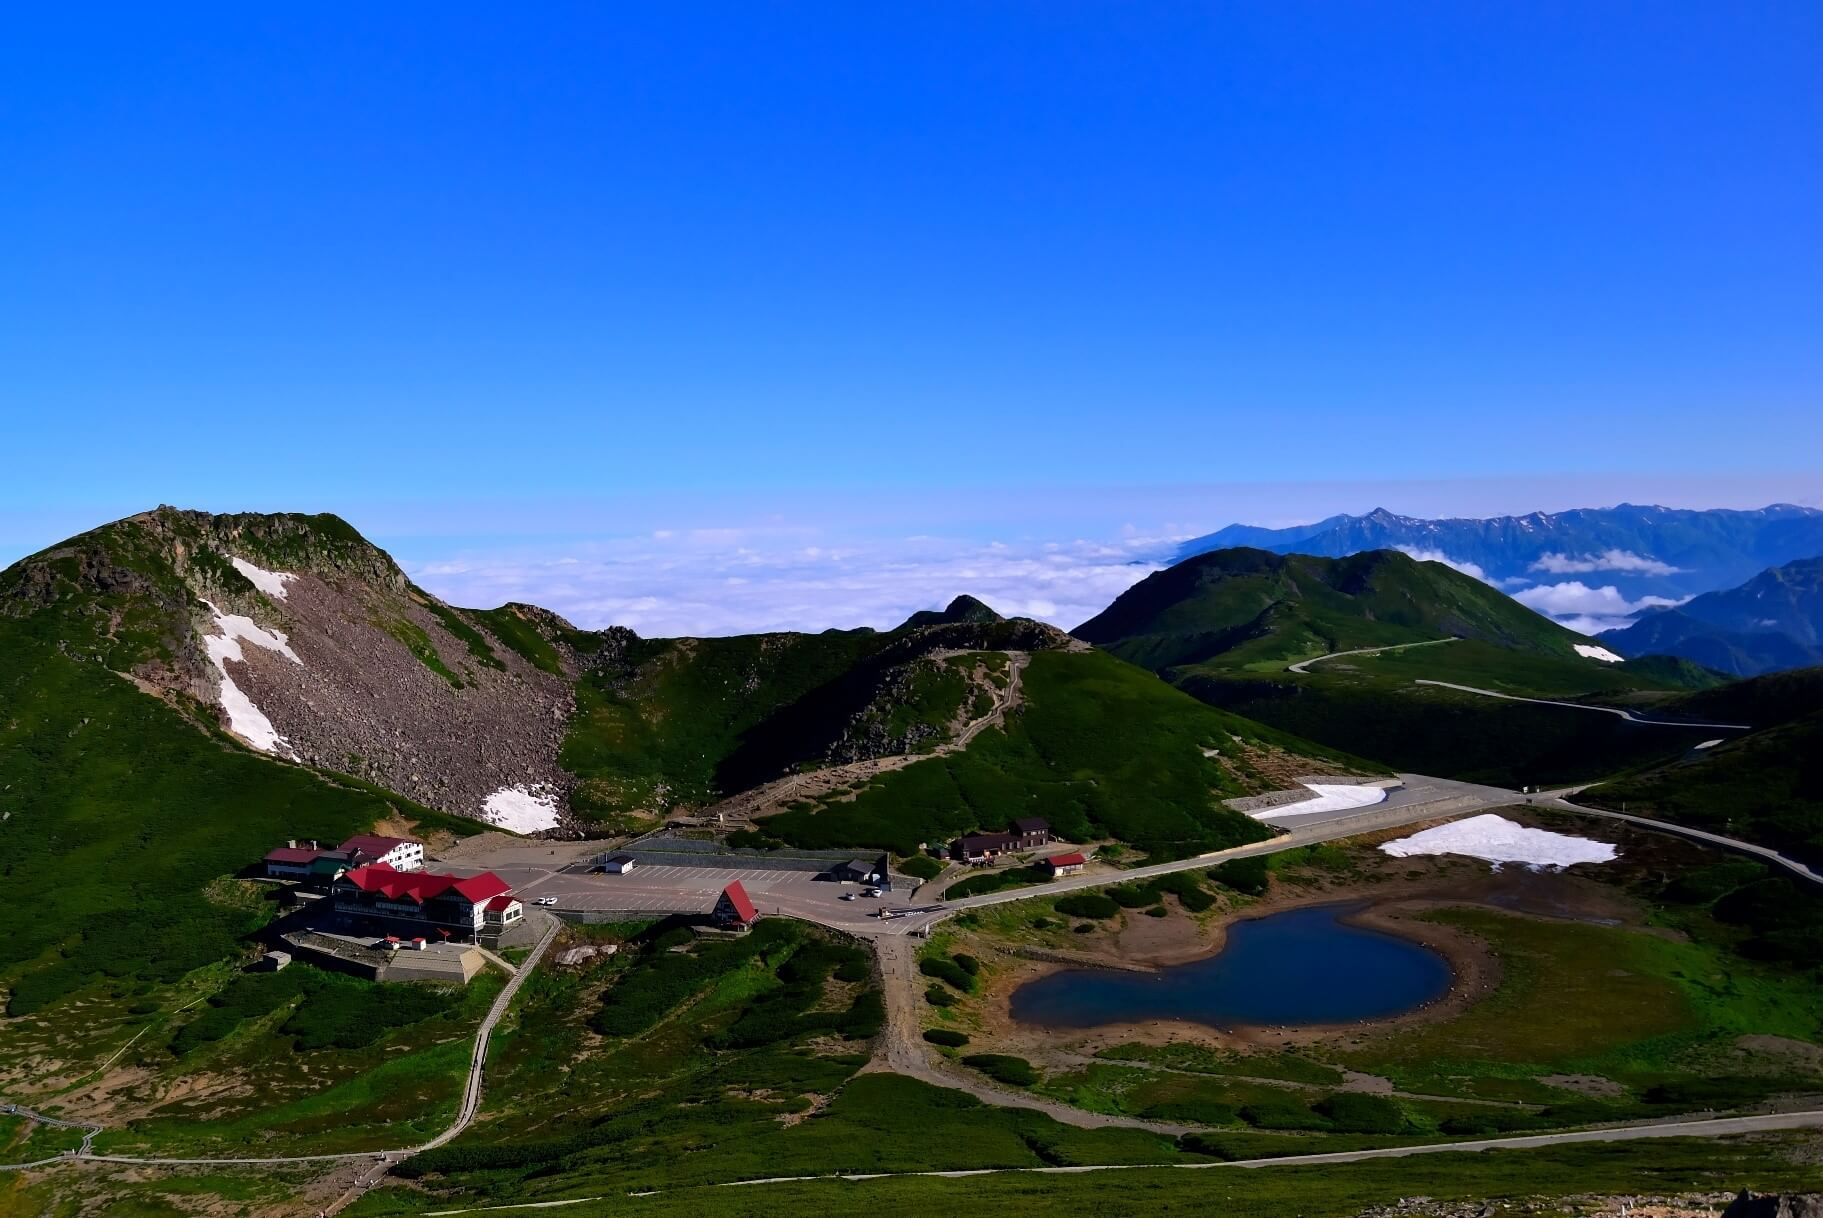 【国内・中部】 乗鞍高原、蓼科高原、上高地、奈良井宿を行く 松本滞在の旅